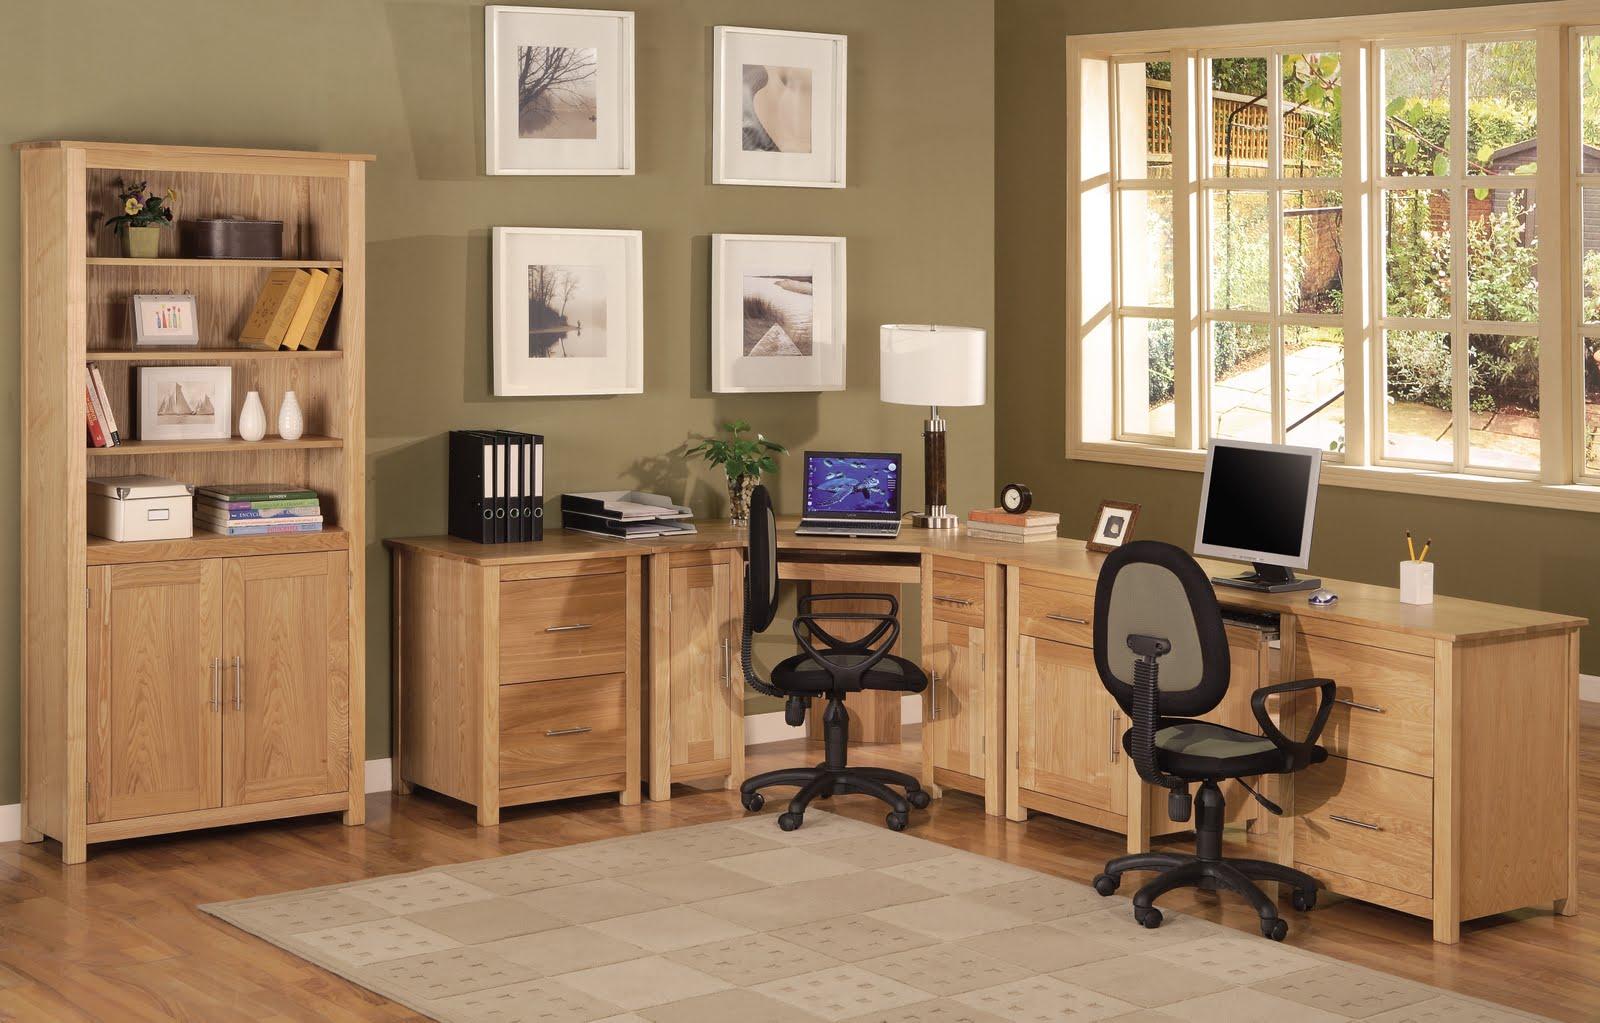 Welcome To Homewood Right Price Furniture Ltd Buys Homewood Interiors Ltd